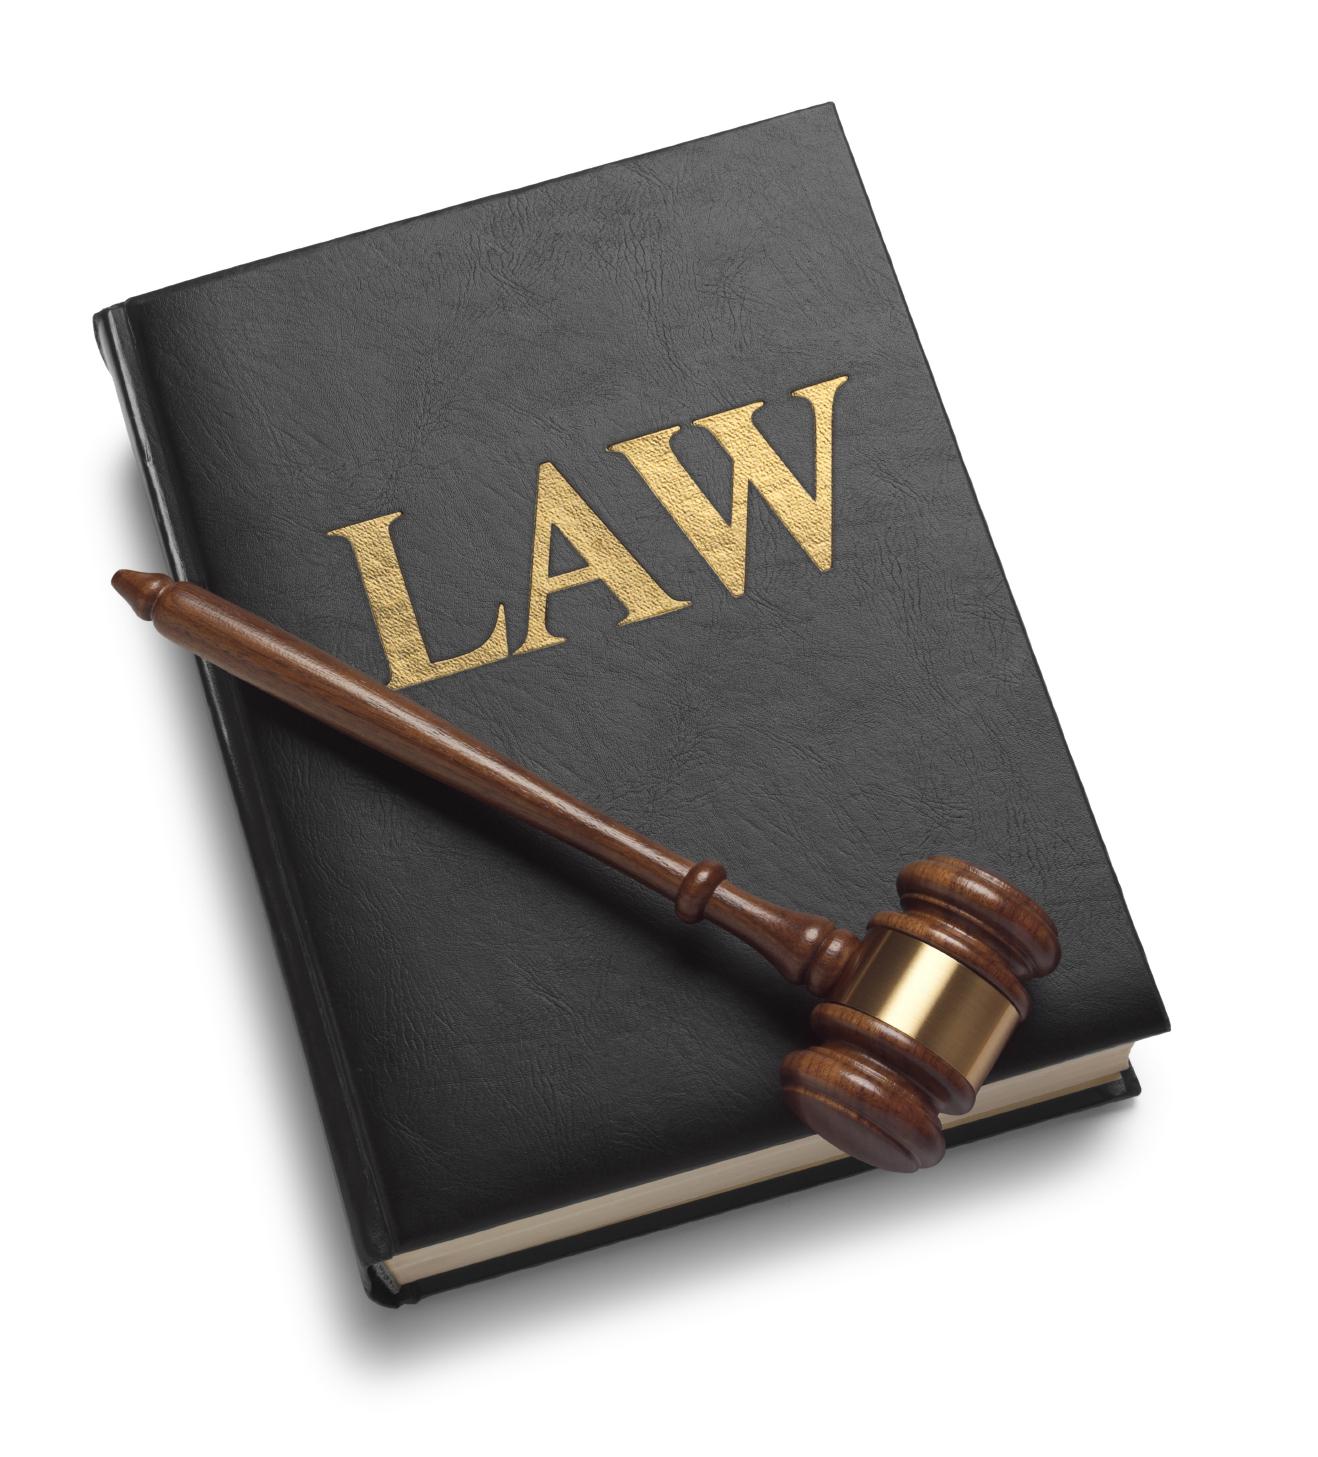 https://i2.wp.com/www.shestokas.com/wp-content/uploads/2013/02/Law.jpg